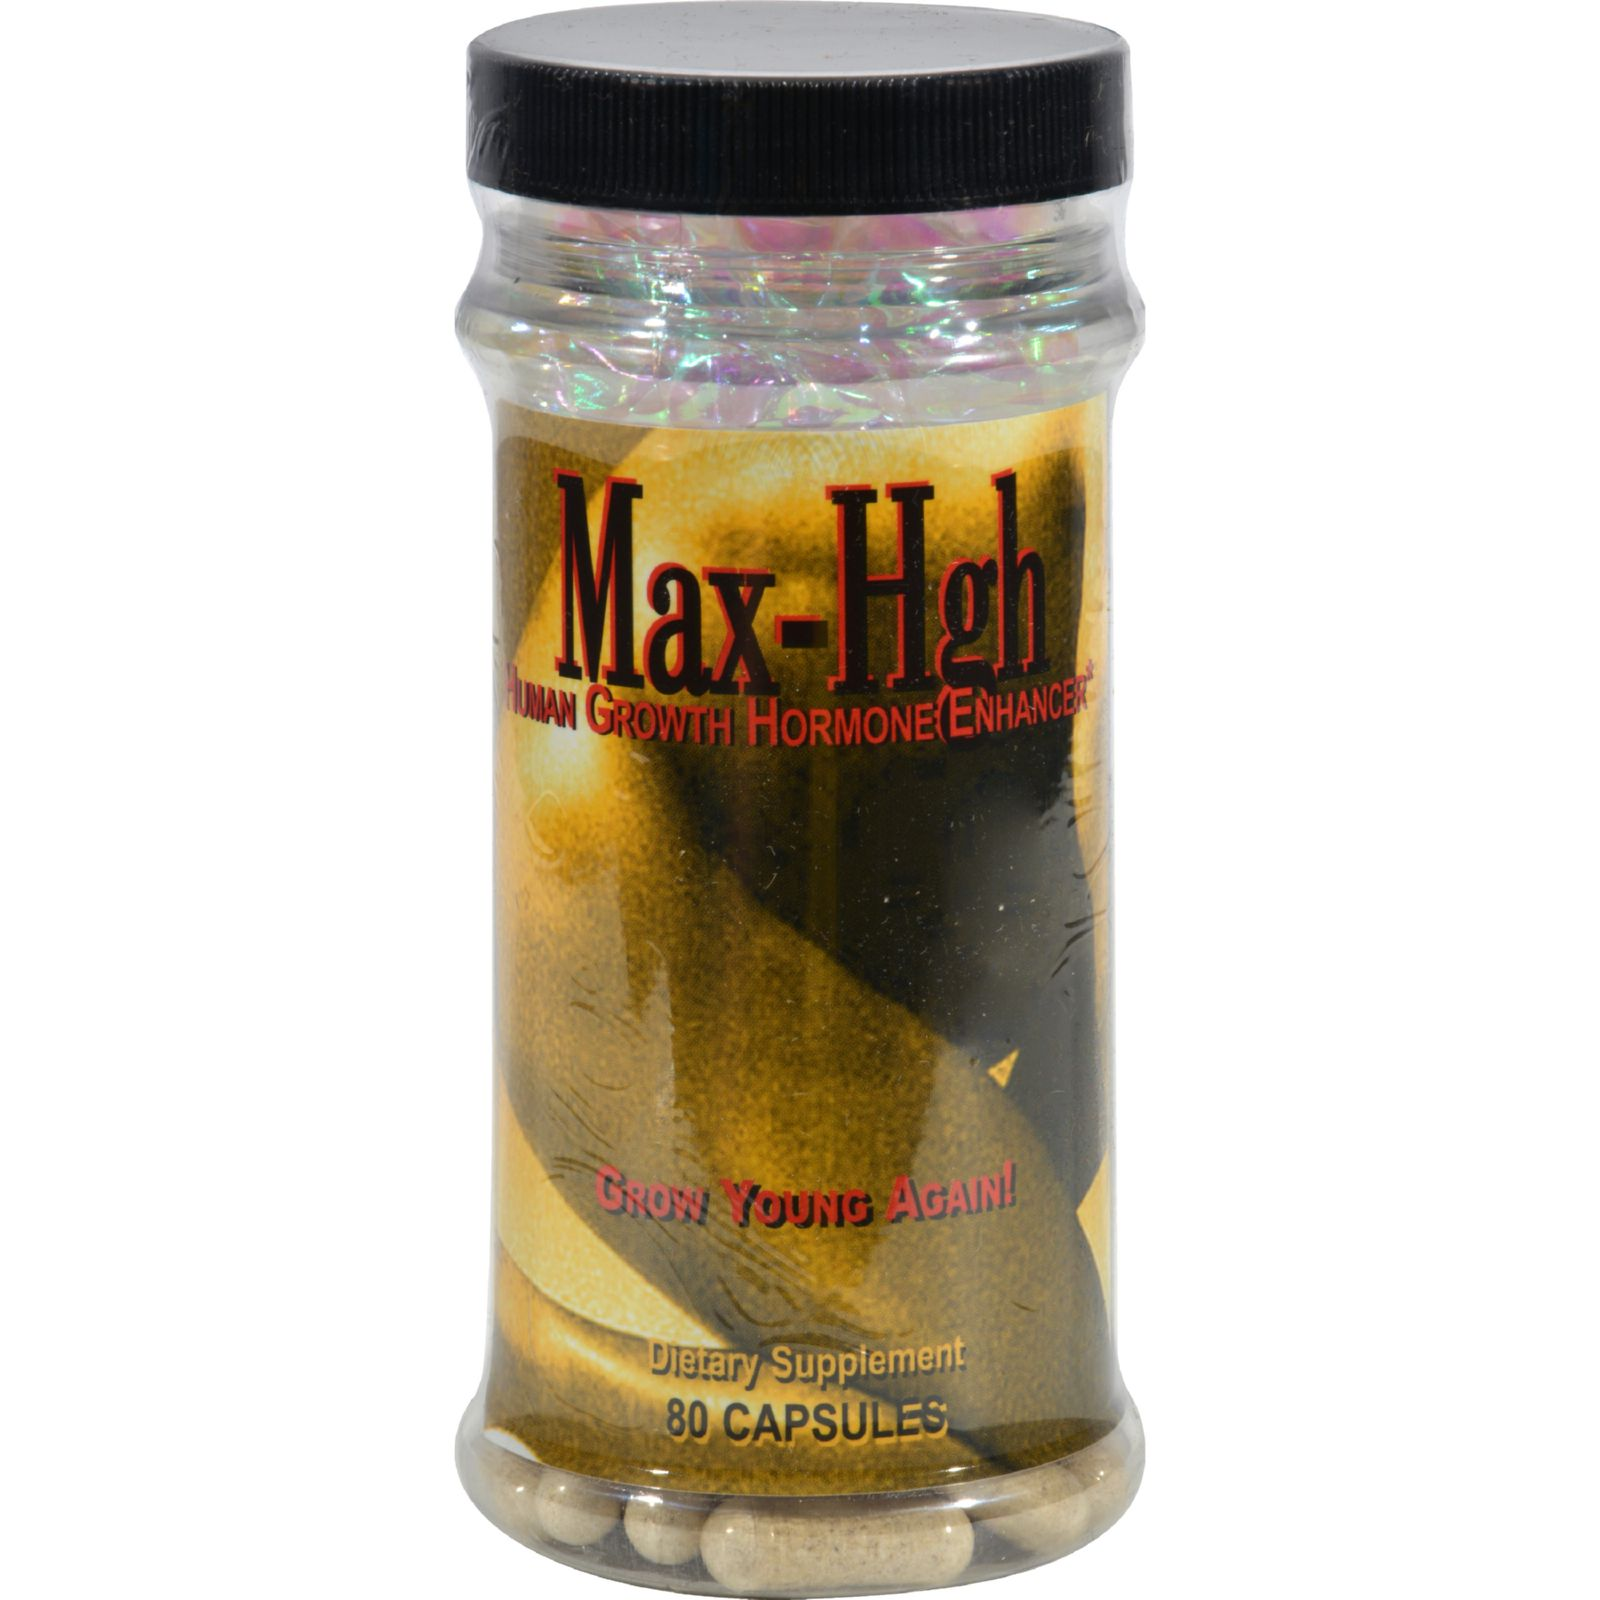 Maximum International Max HGH Human Growth Hormone Enhancer Capsules, 80 Ct